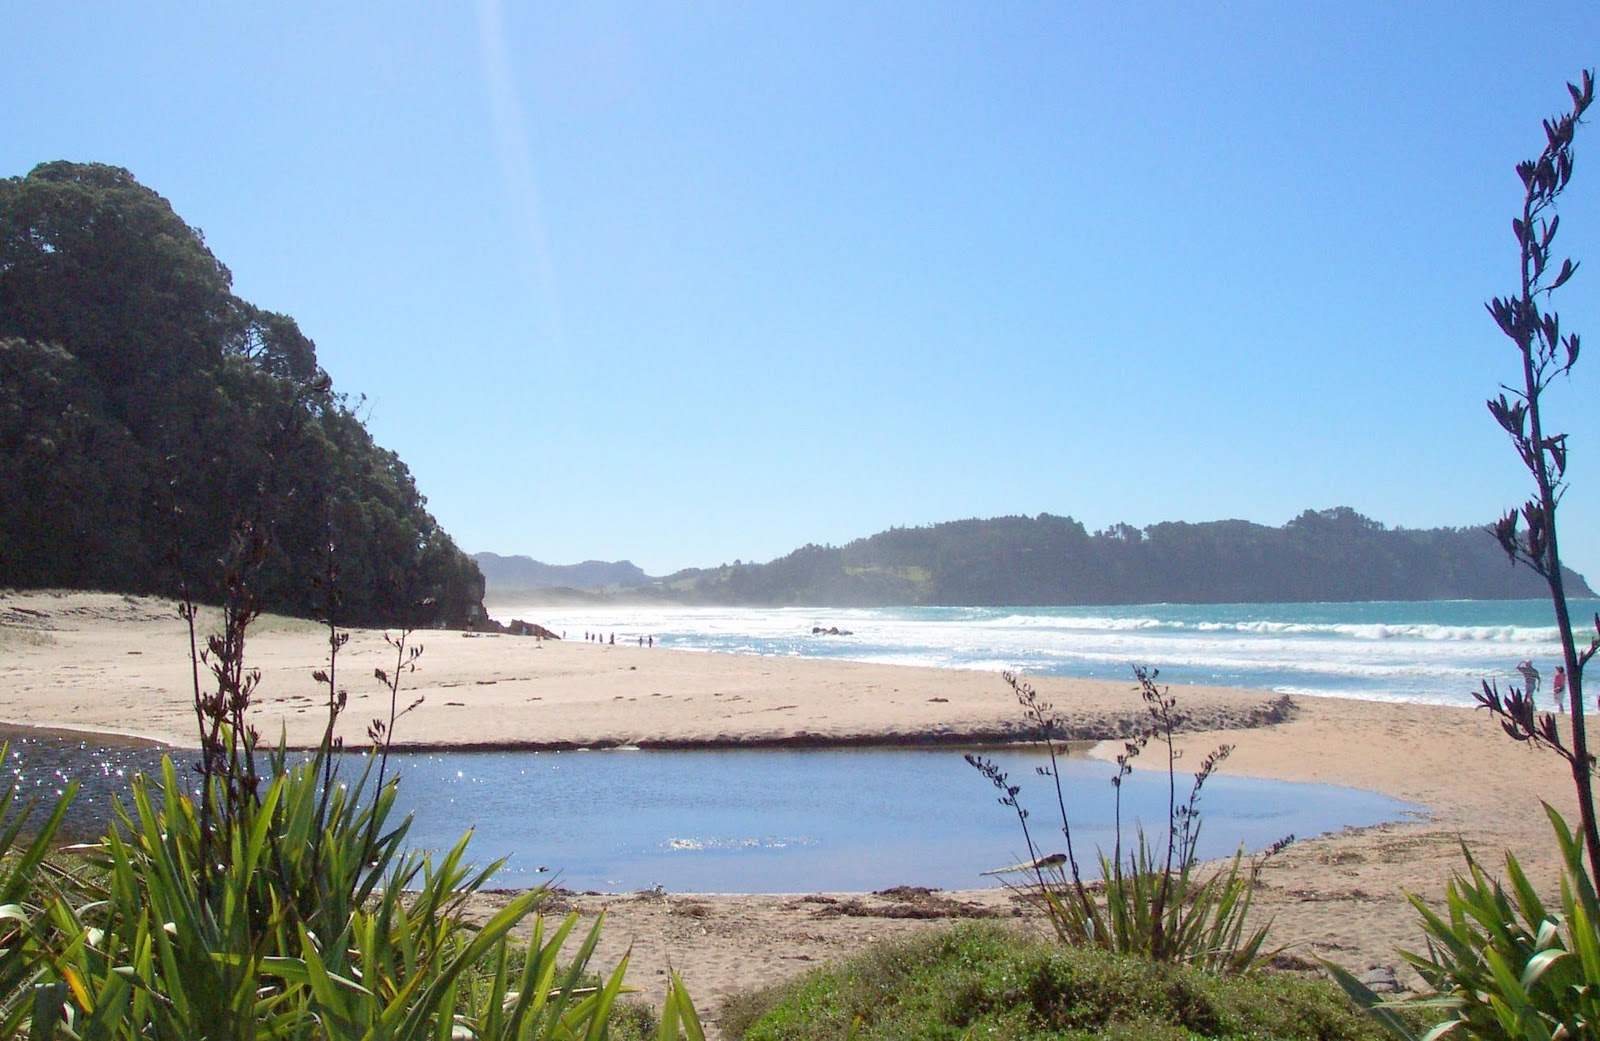 melulater: beach scenes